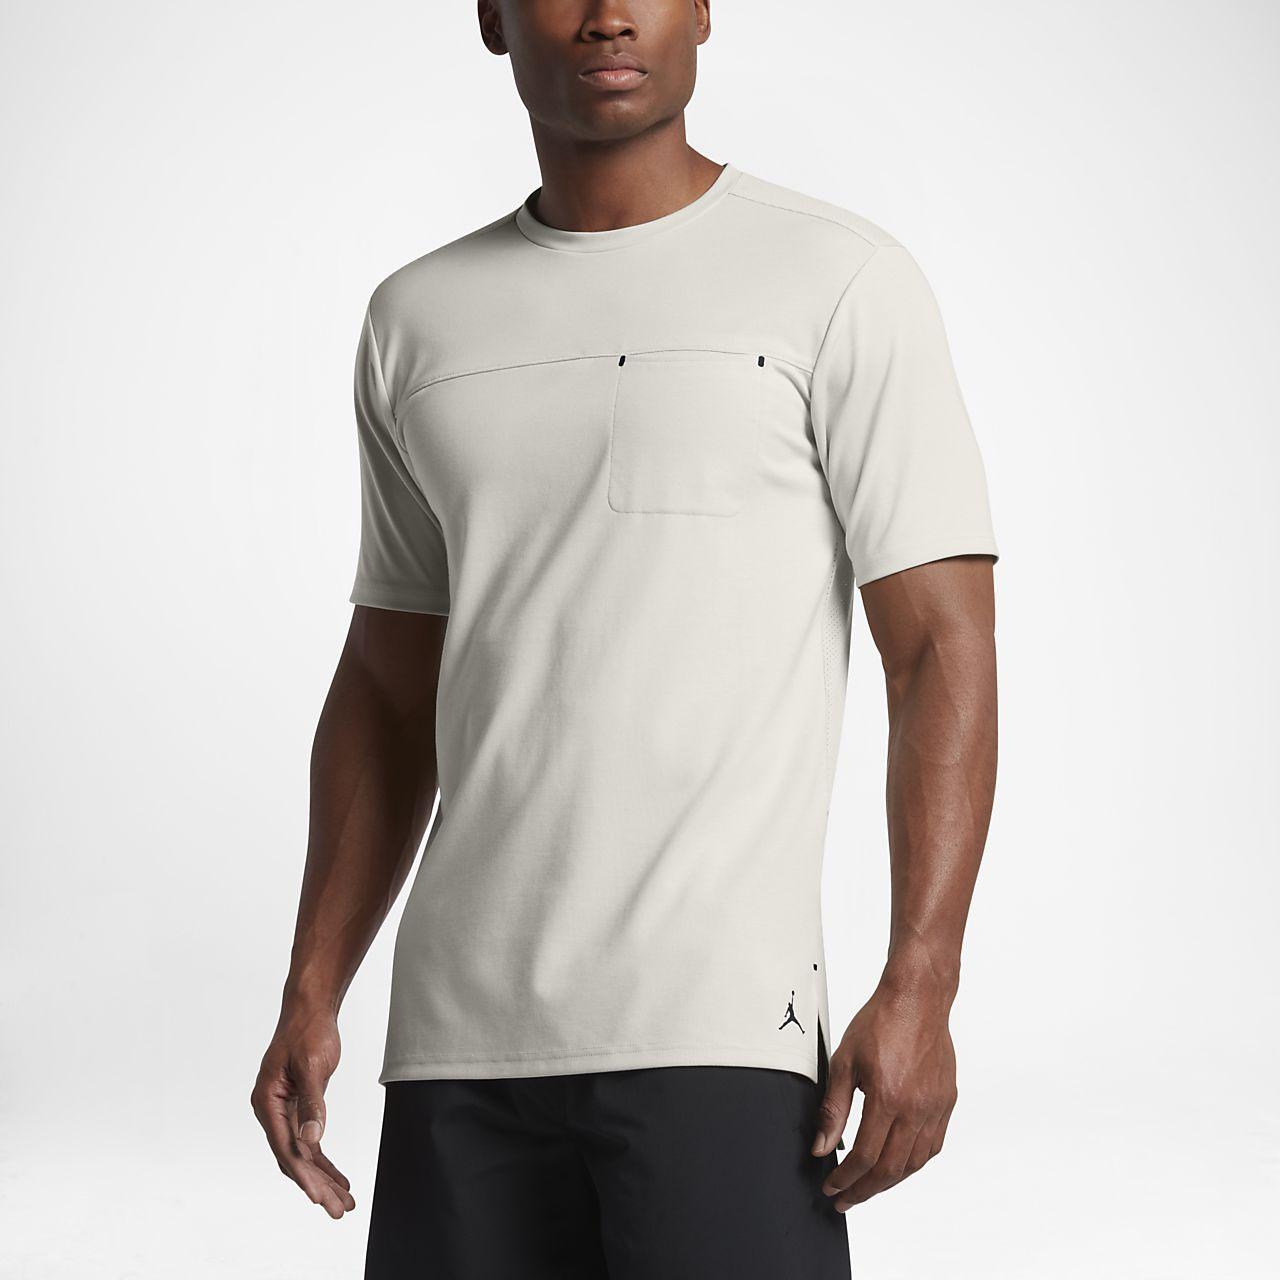 Jordan 23 Lux Pocket 男子T恤